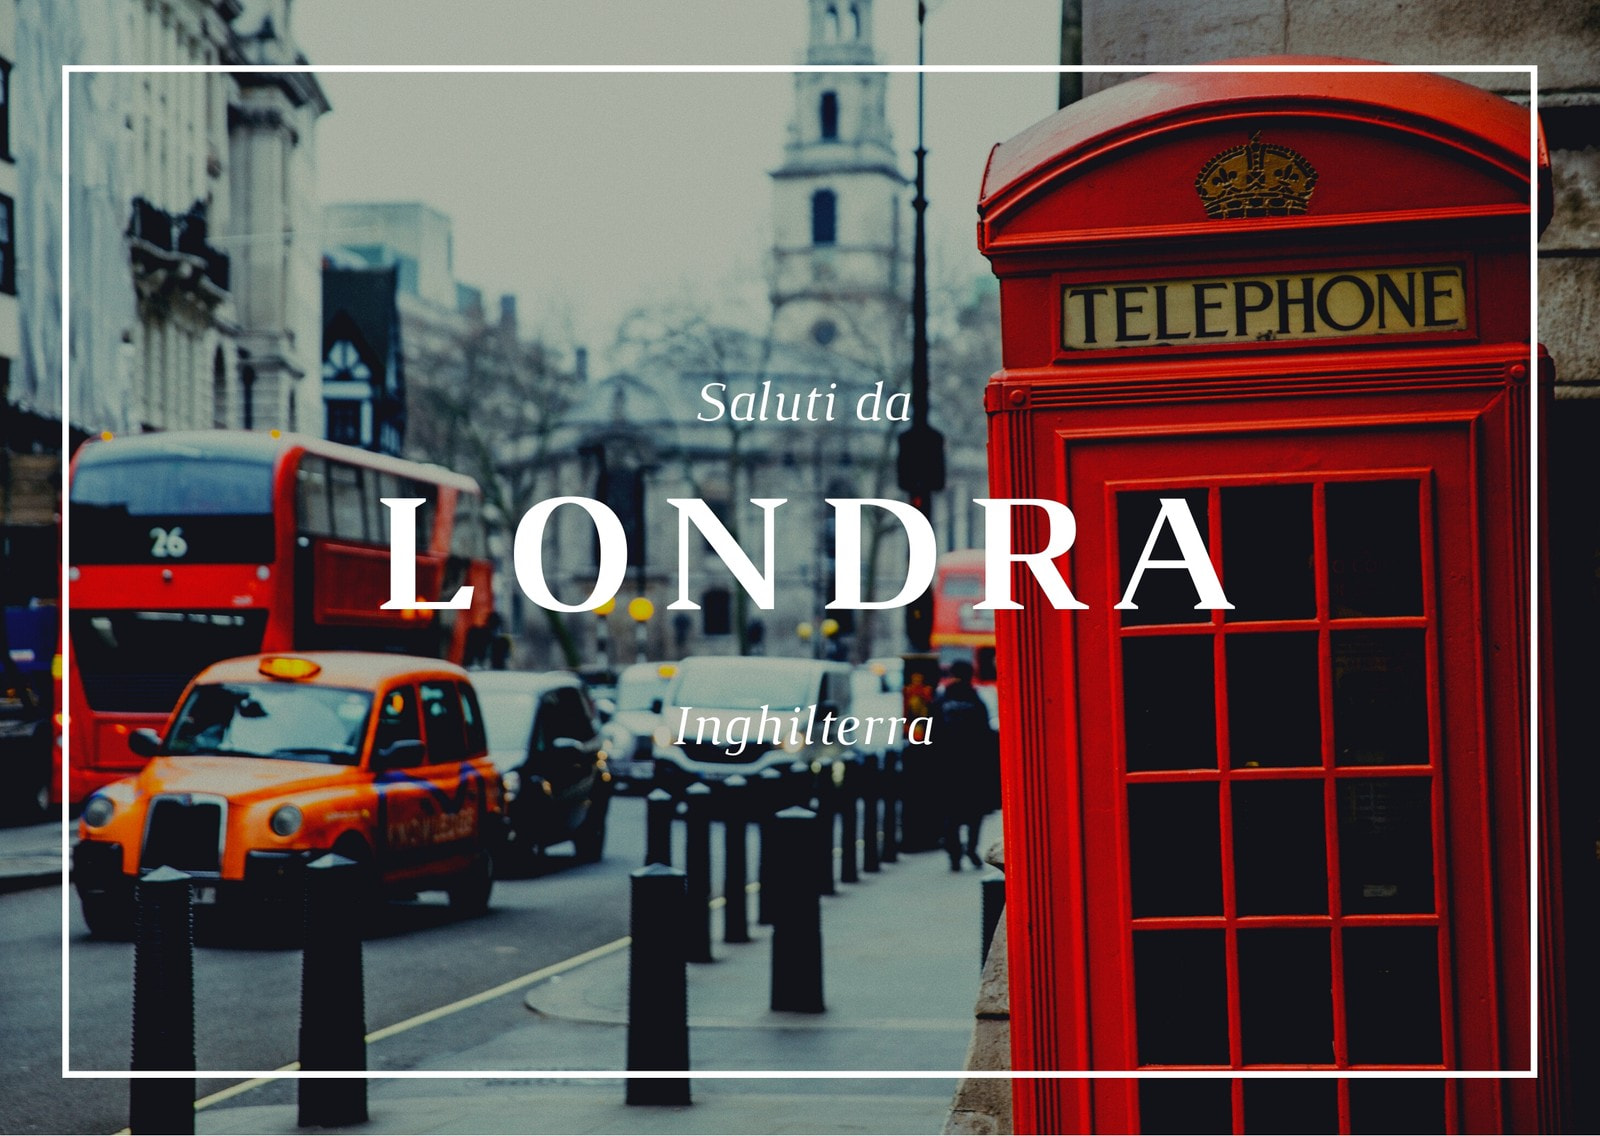 Rosso Londra Cabina Telefonica Immagine Cartolina